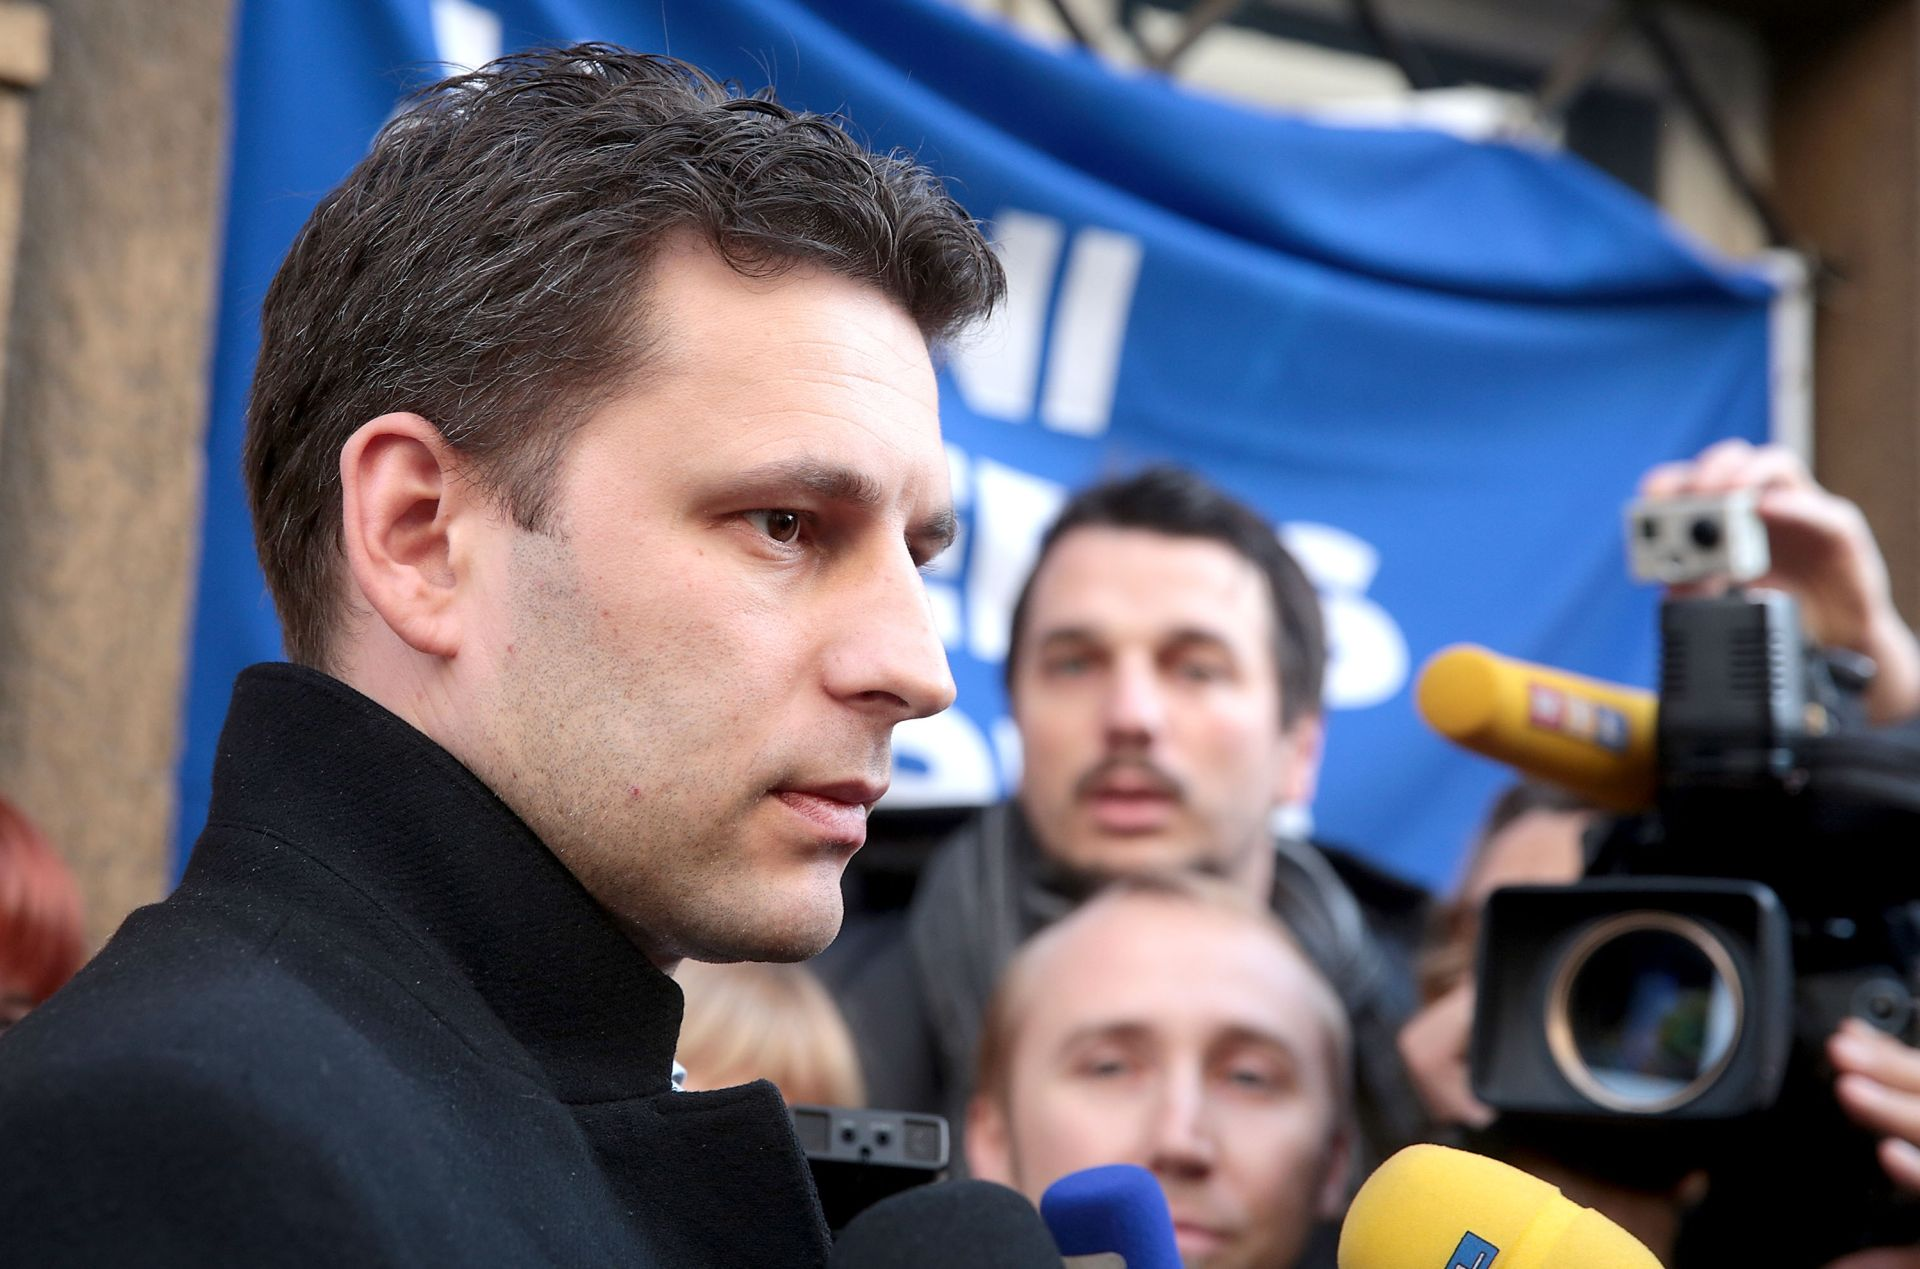 Petrov u Bleiburgu iskritizairao političare